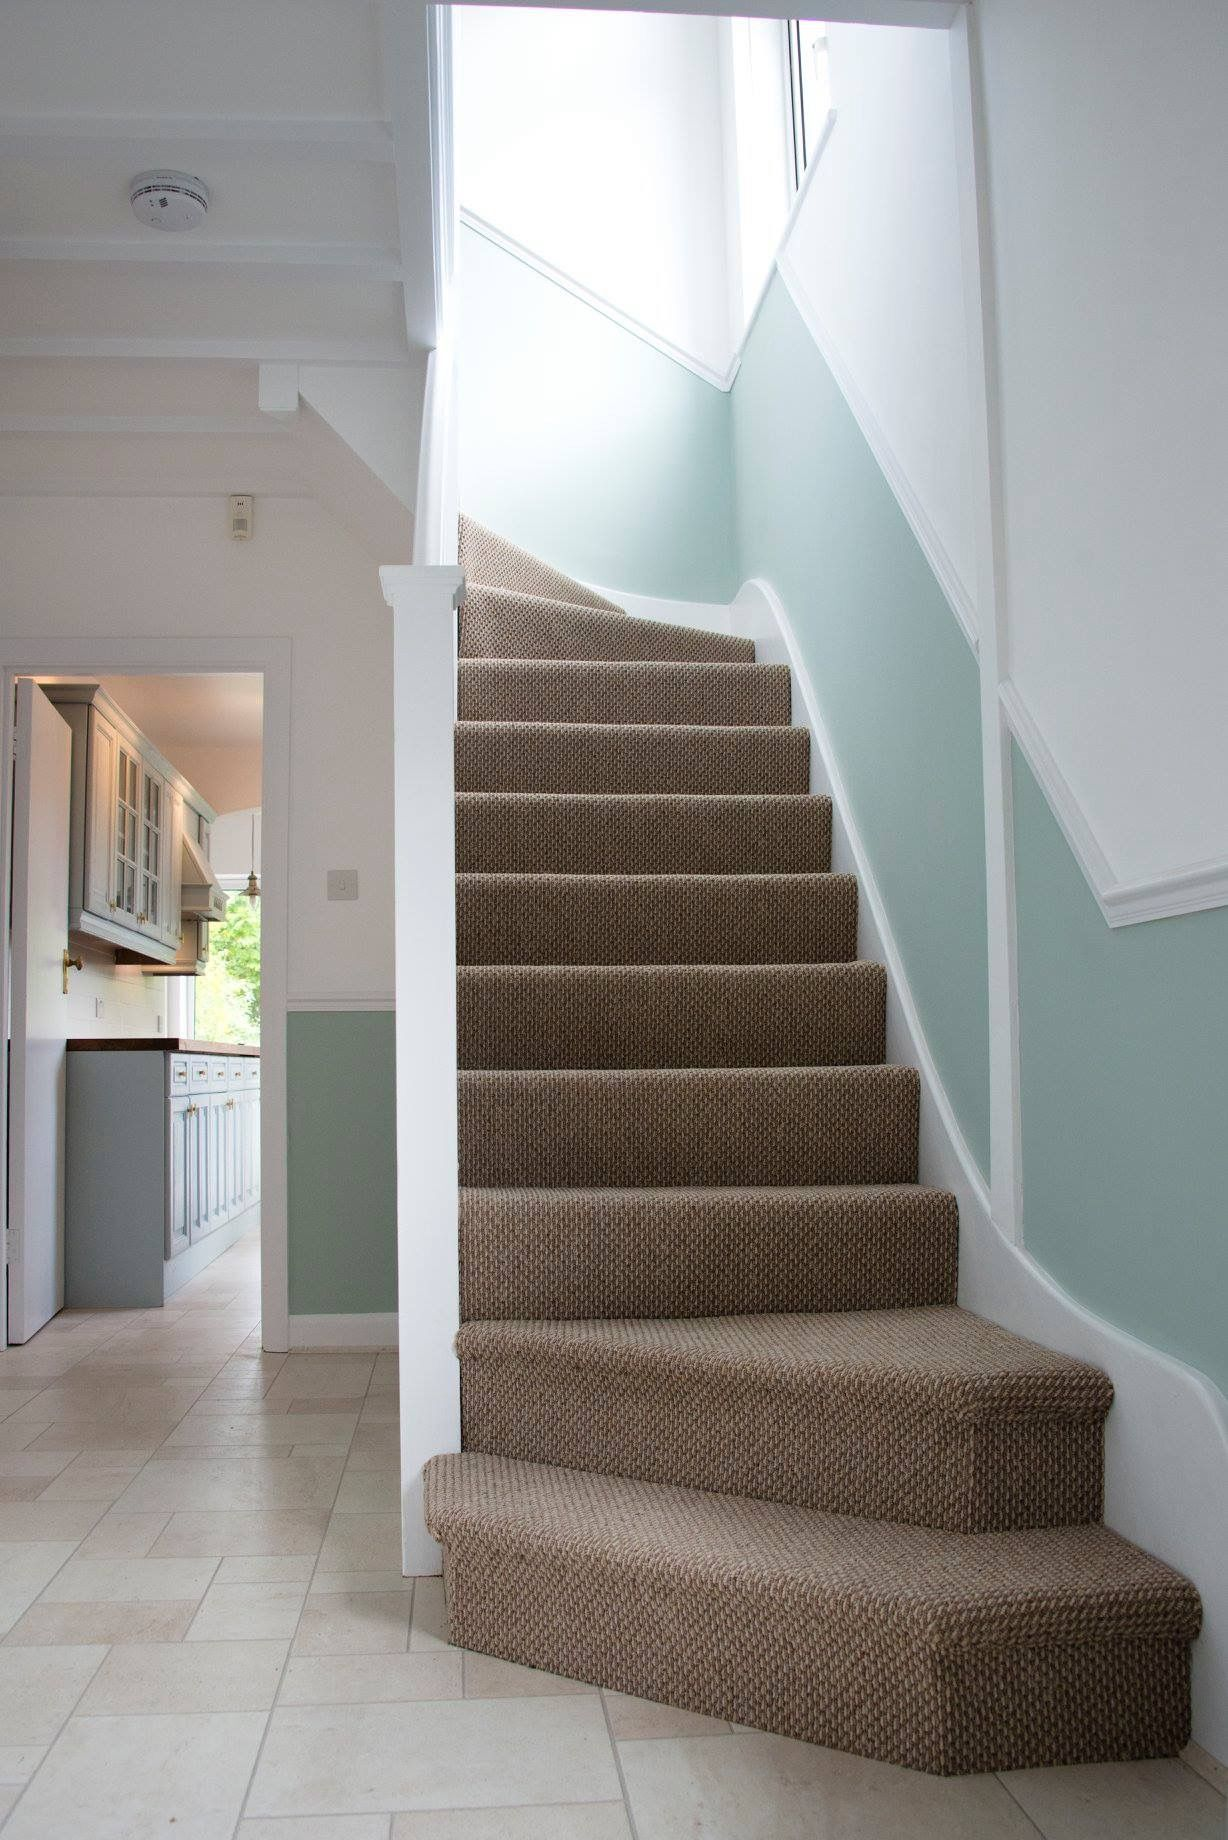 Colour Ideas Living Room Dado Rail Wall Shelves For Hallway Flooring By Quickstep Exquisa 1553. ...